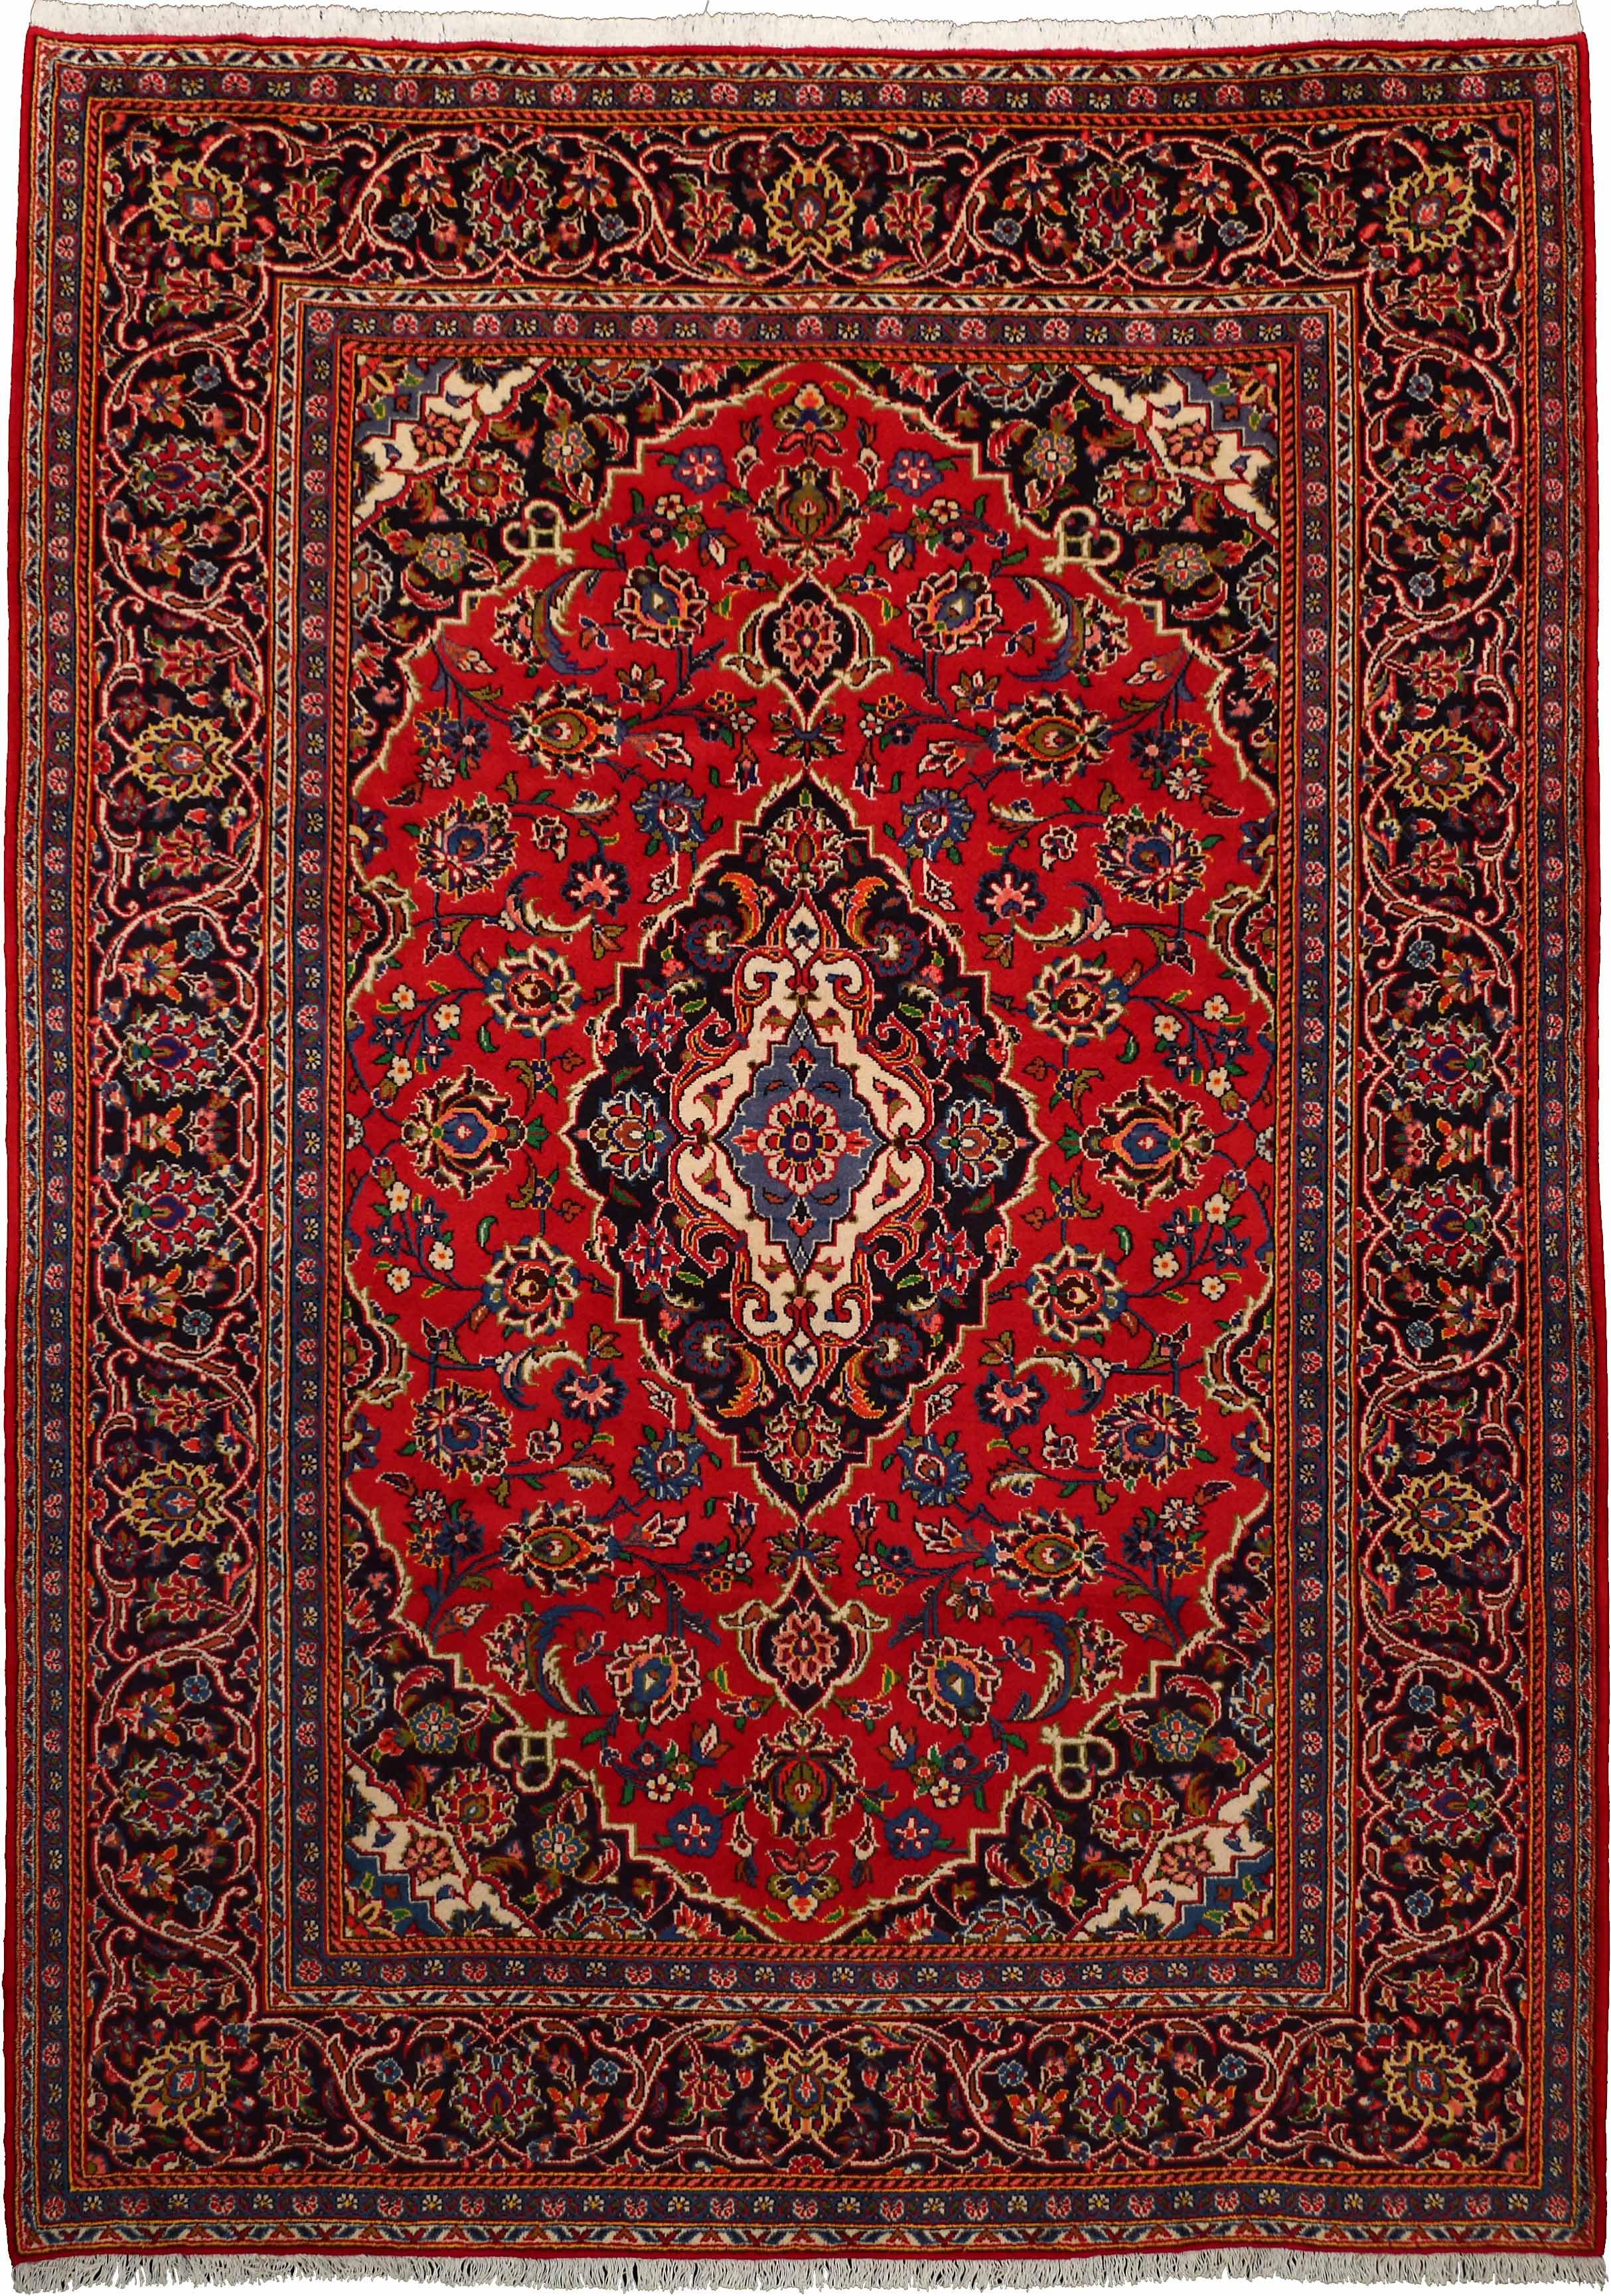 12360 Kashan 278x198cm Iranian Carpet